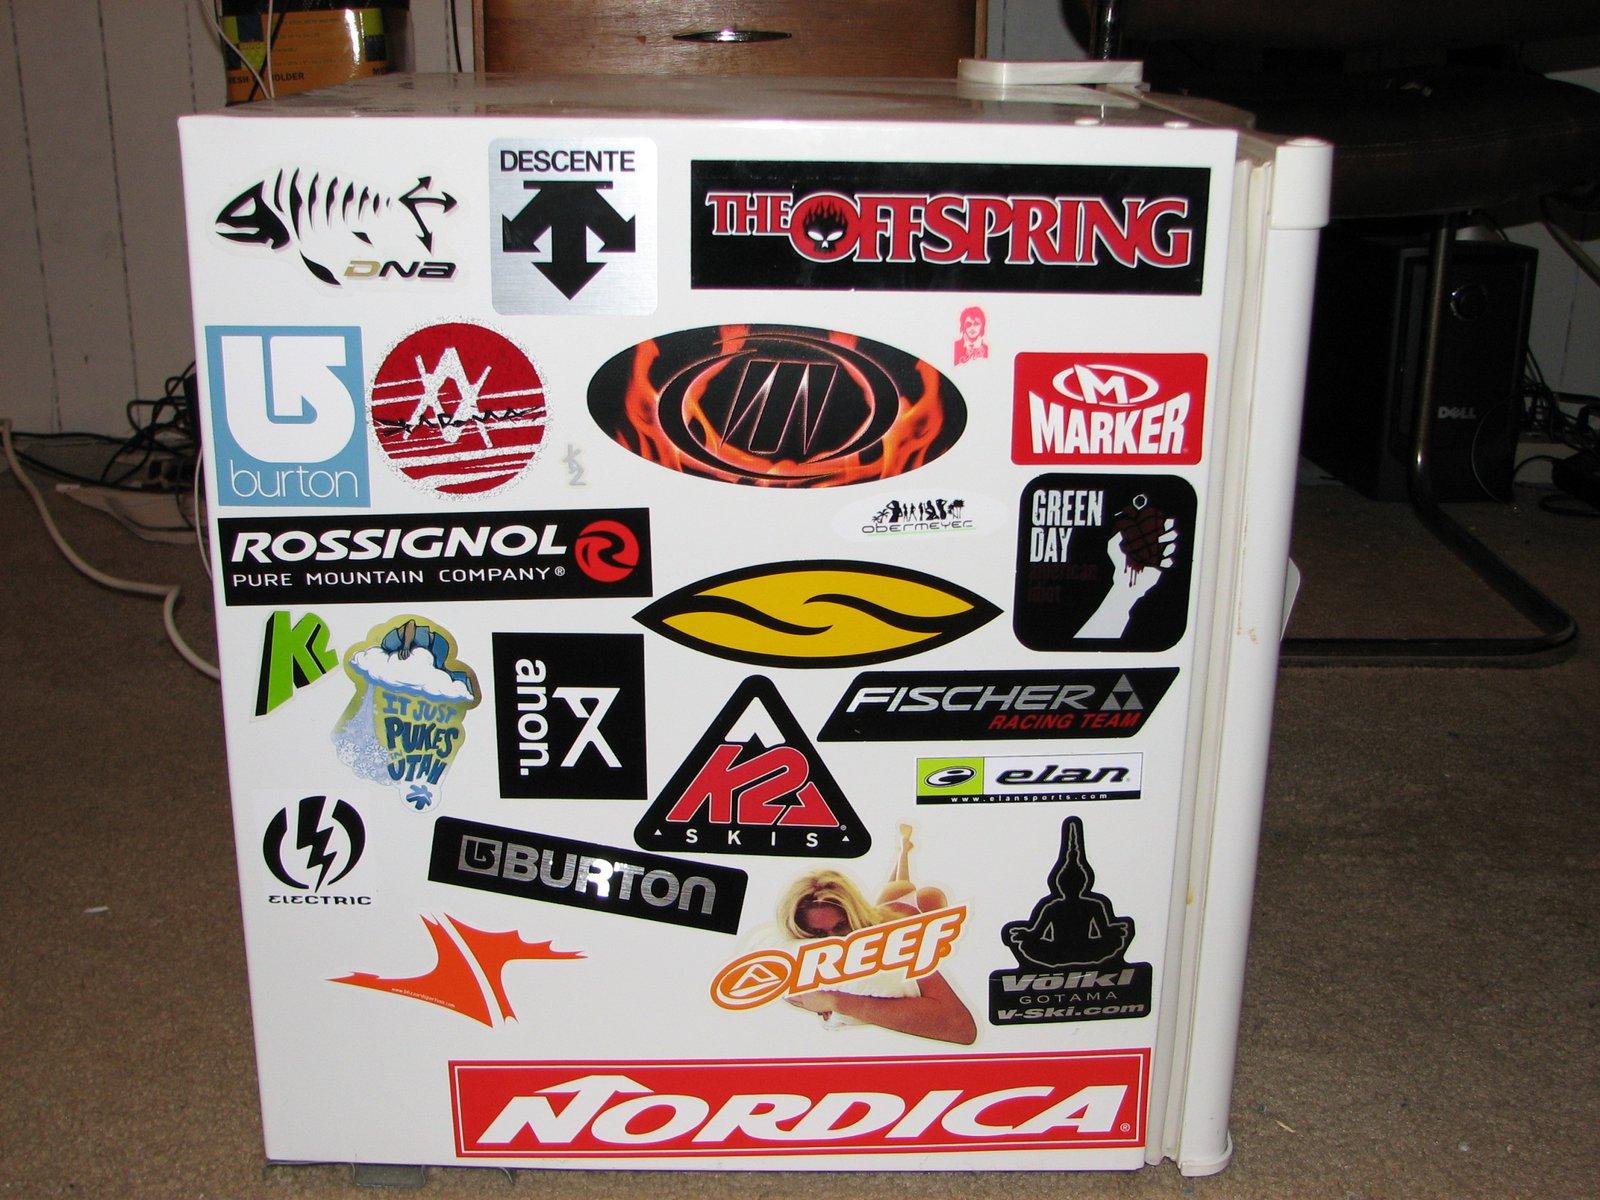 Right fridge